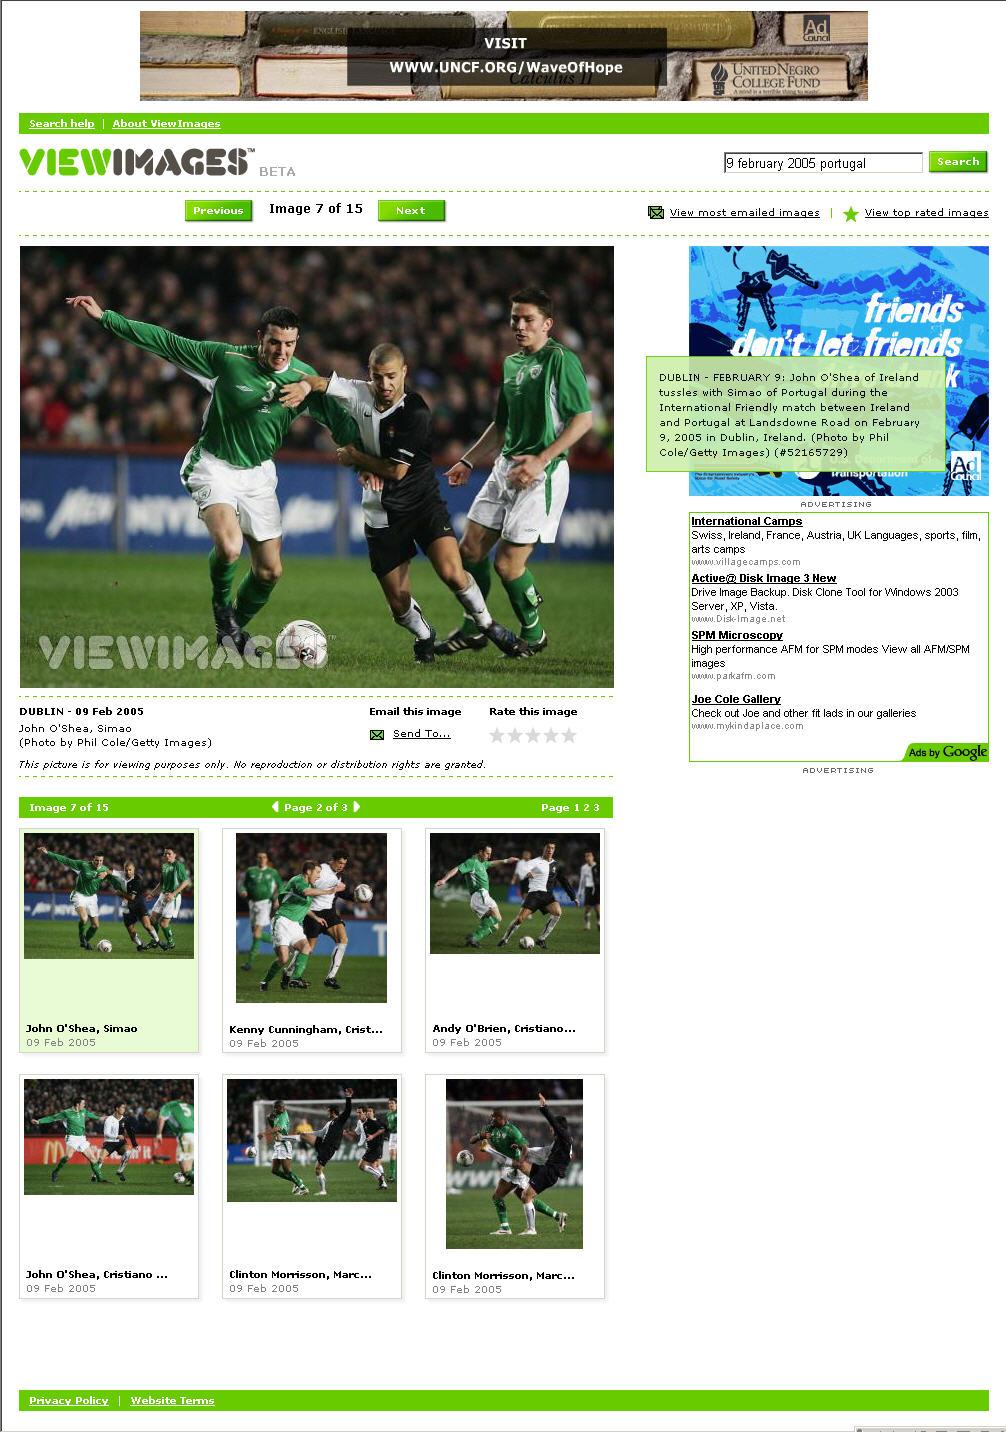 viewimages.com